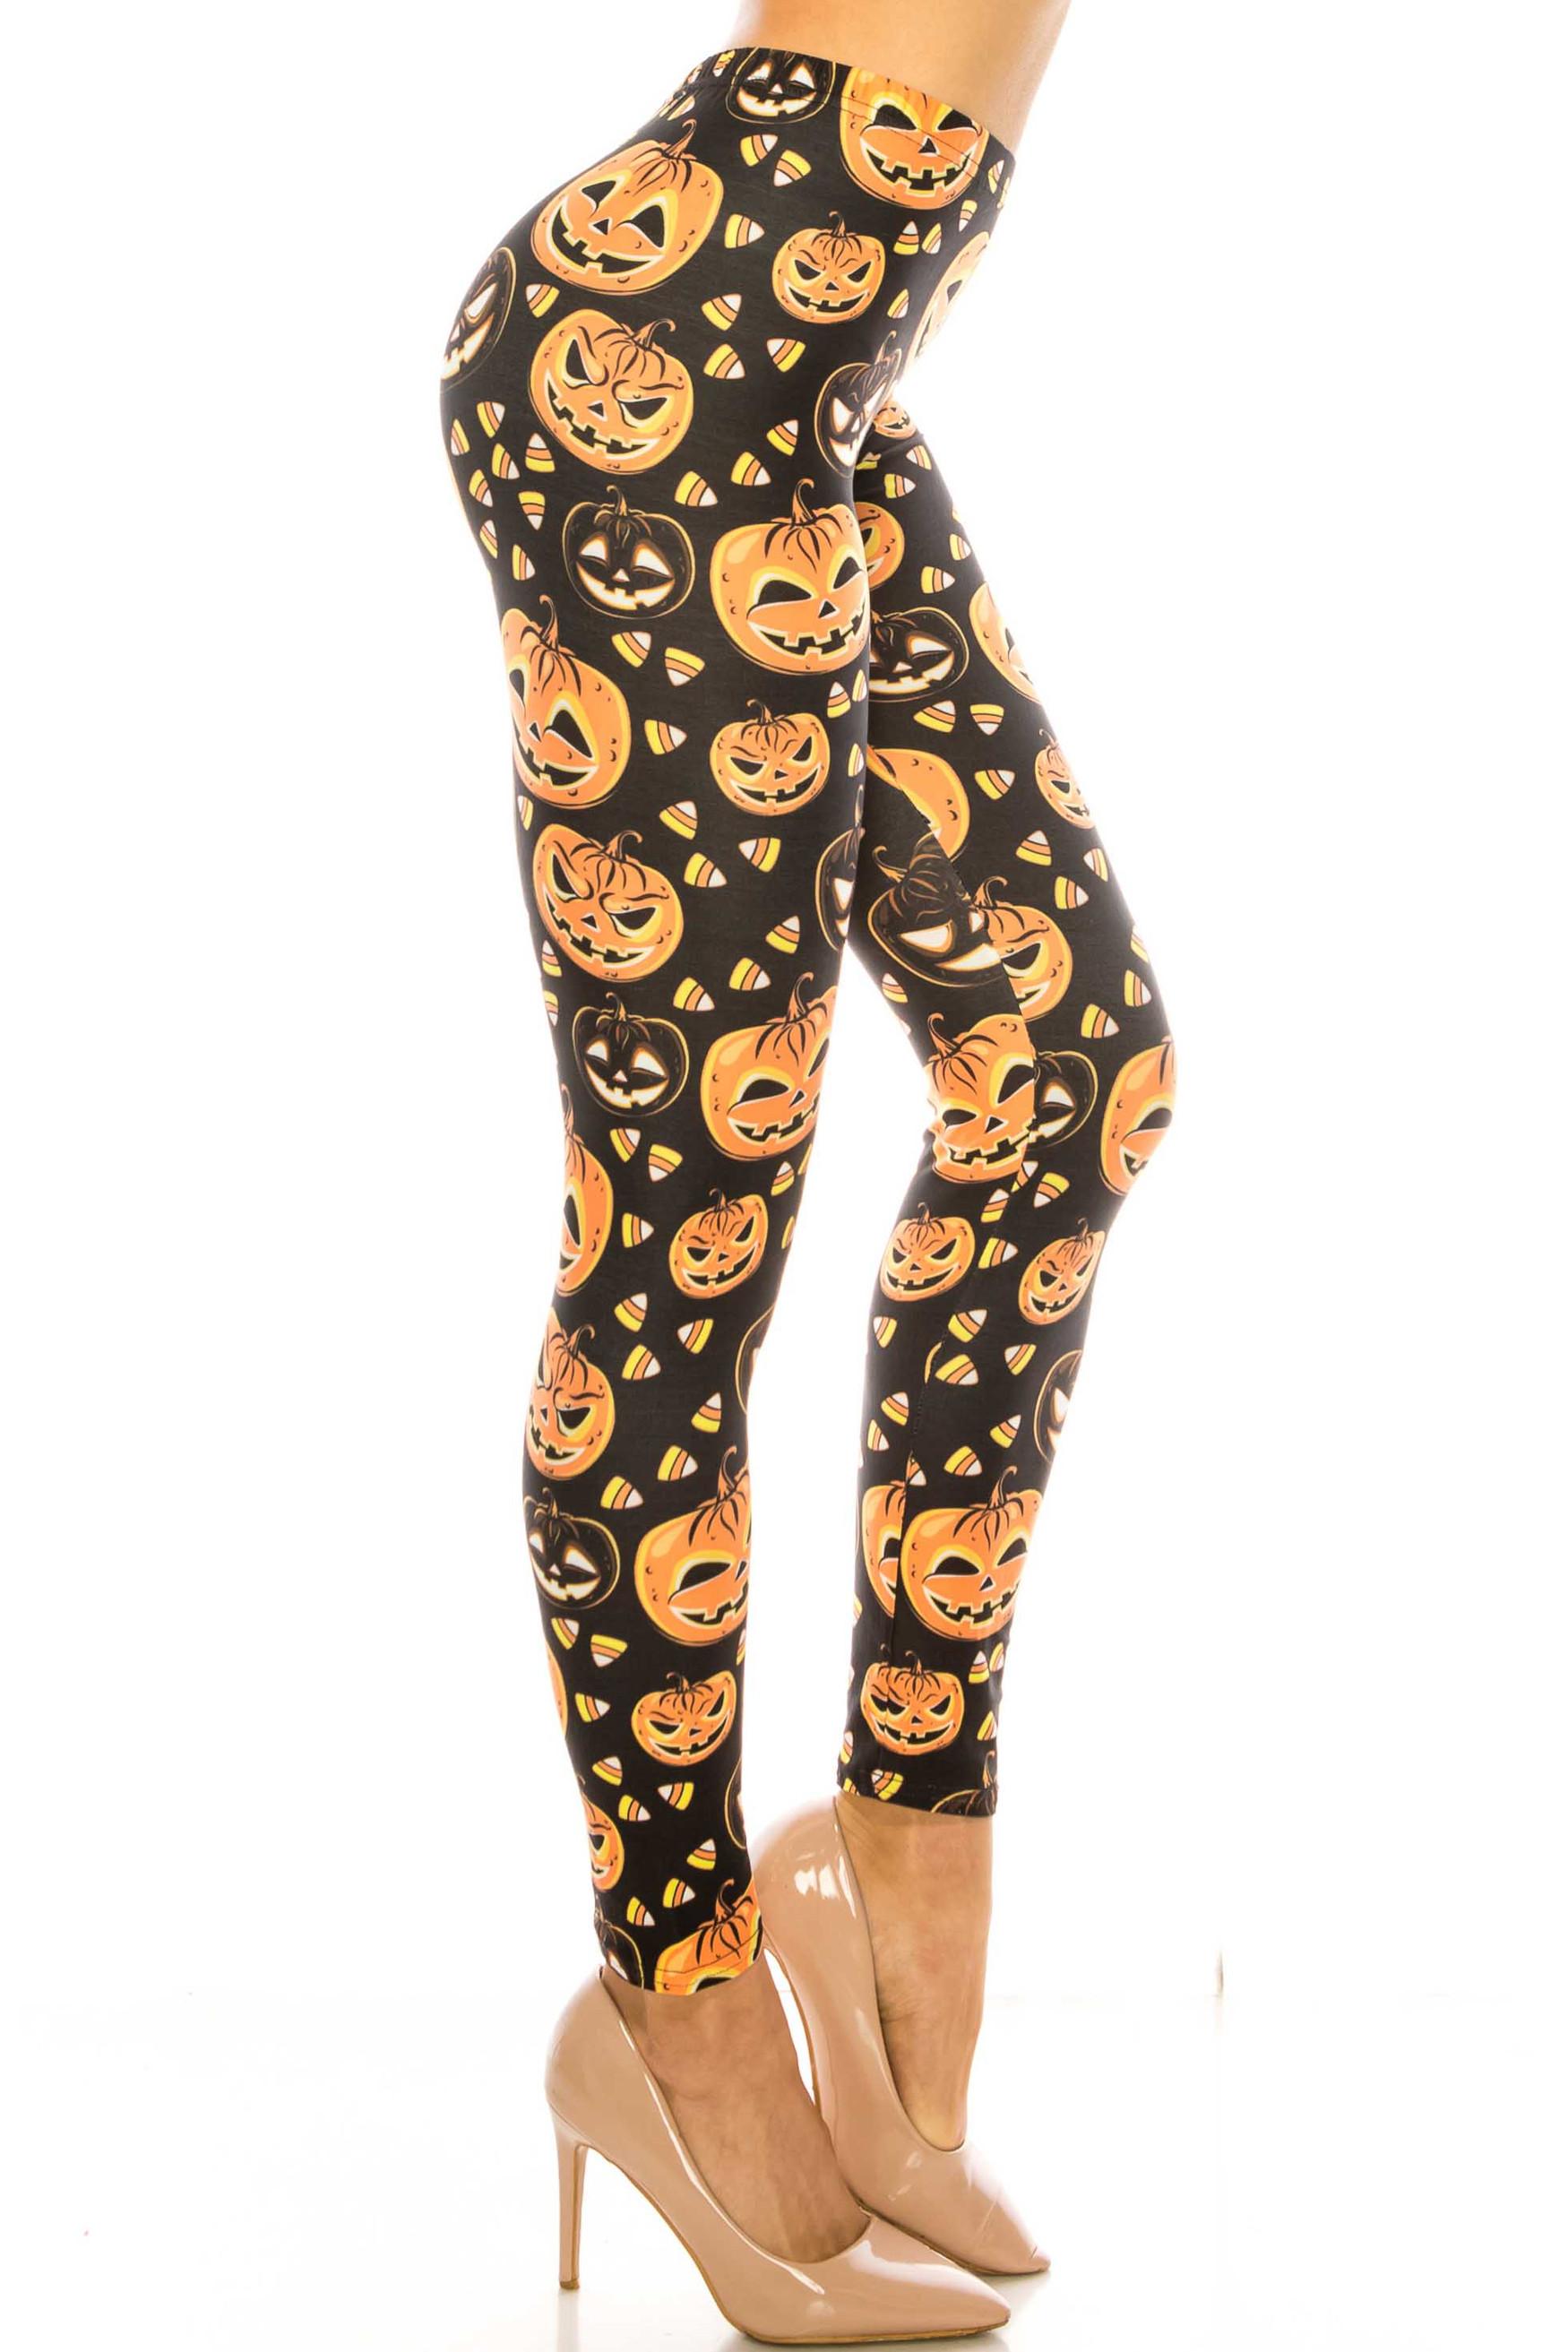 Creamy Soft Halloween Pumpkins Extra Plus Size Leggings - 3X-5X - USA Fashion™